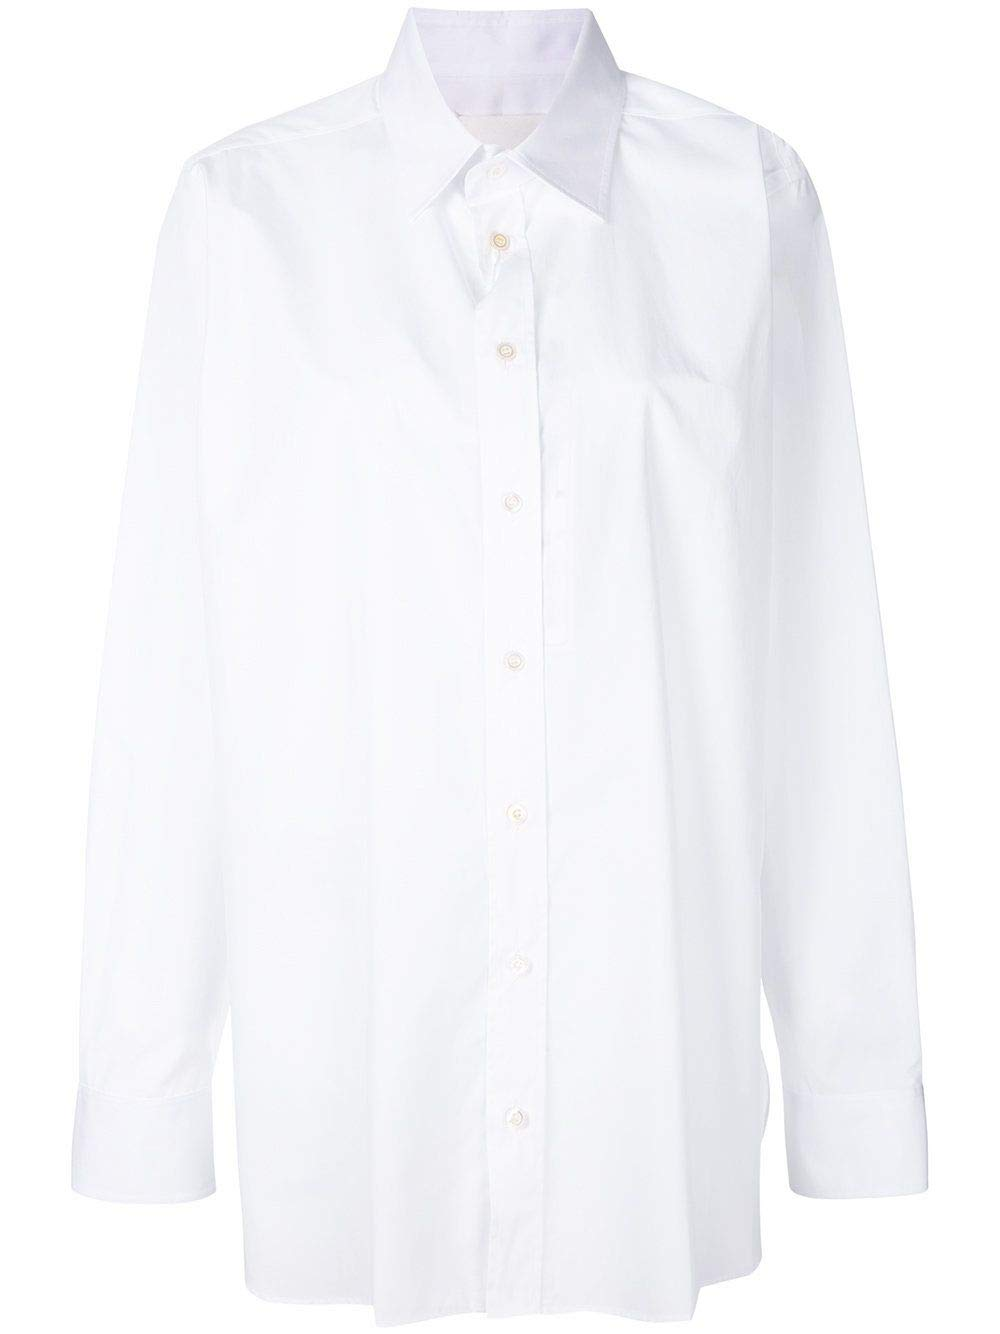 Brand Size 42 MAISON MARGIELA Women's S29DL0120S44720100 White Cotton Shirt